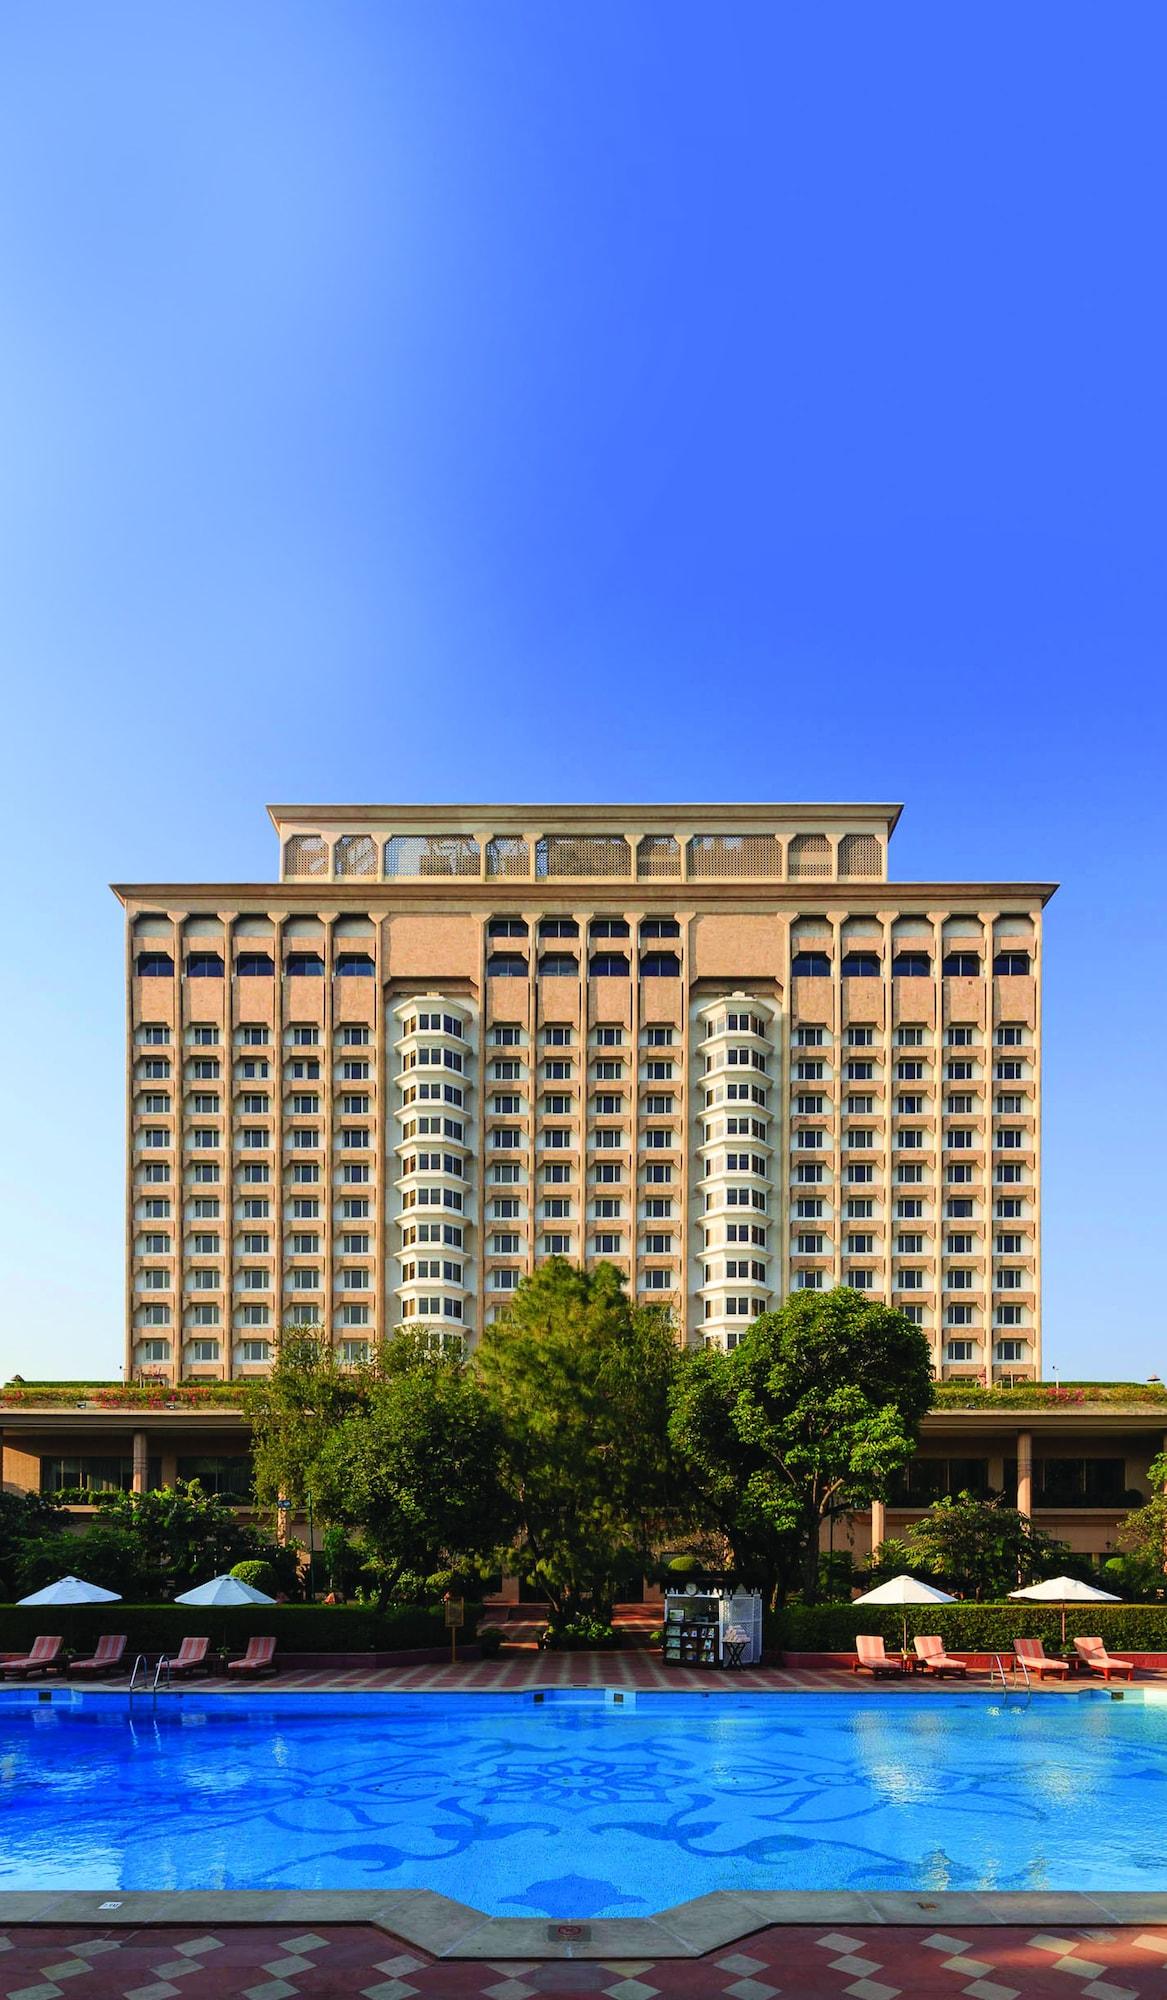 The Taj Mahal Hotel, West